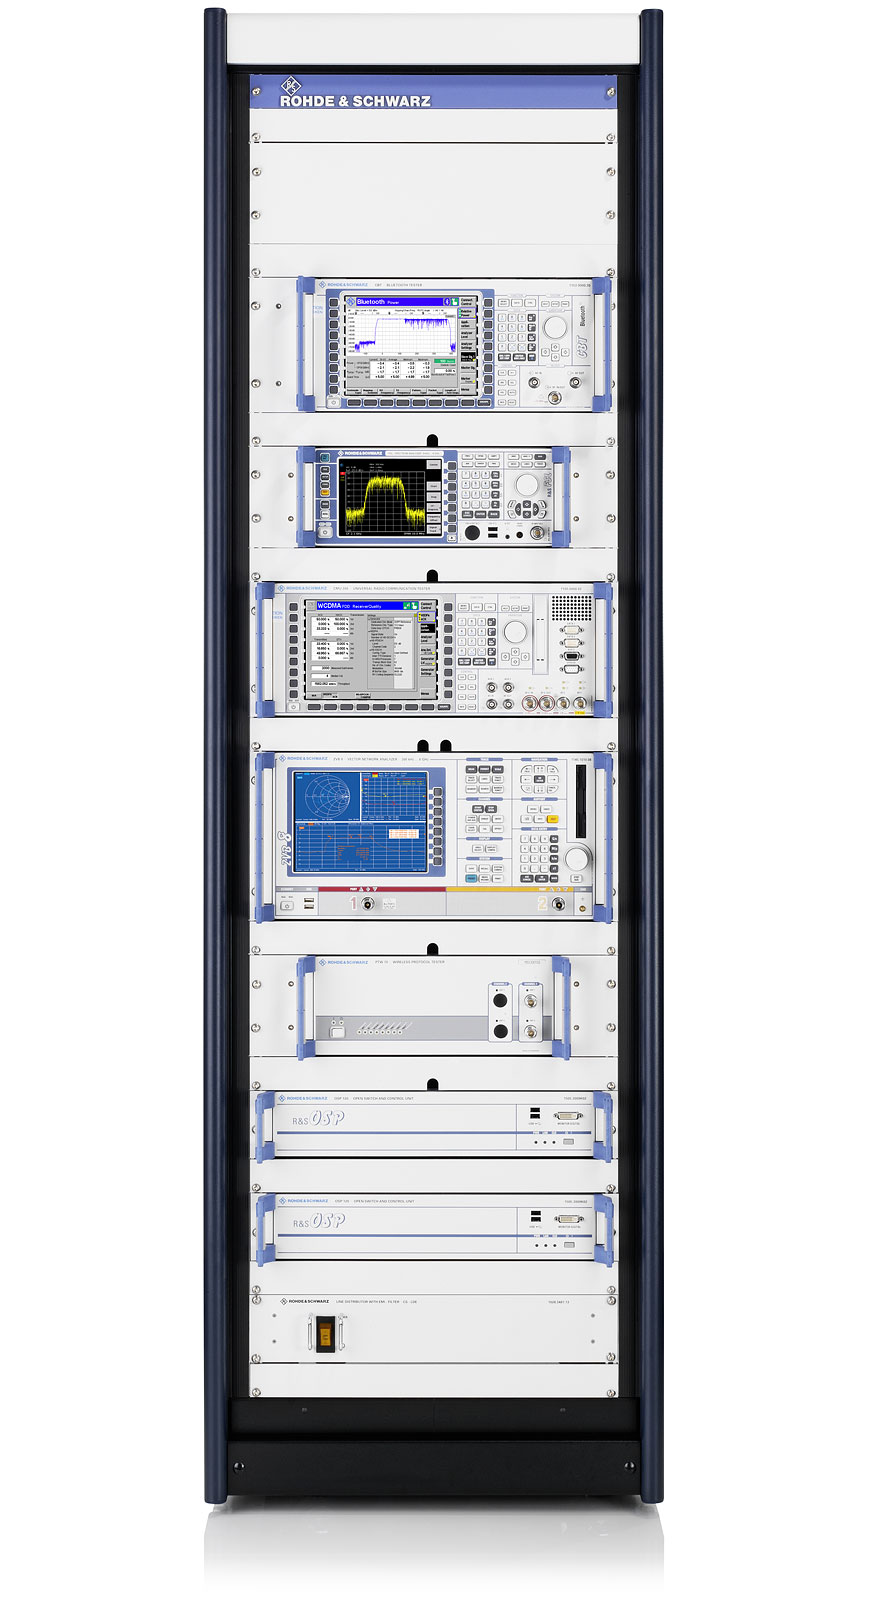 TS8996_front.jpg